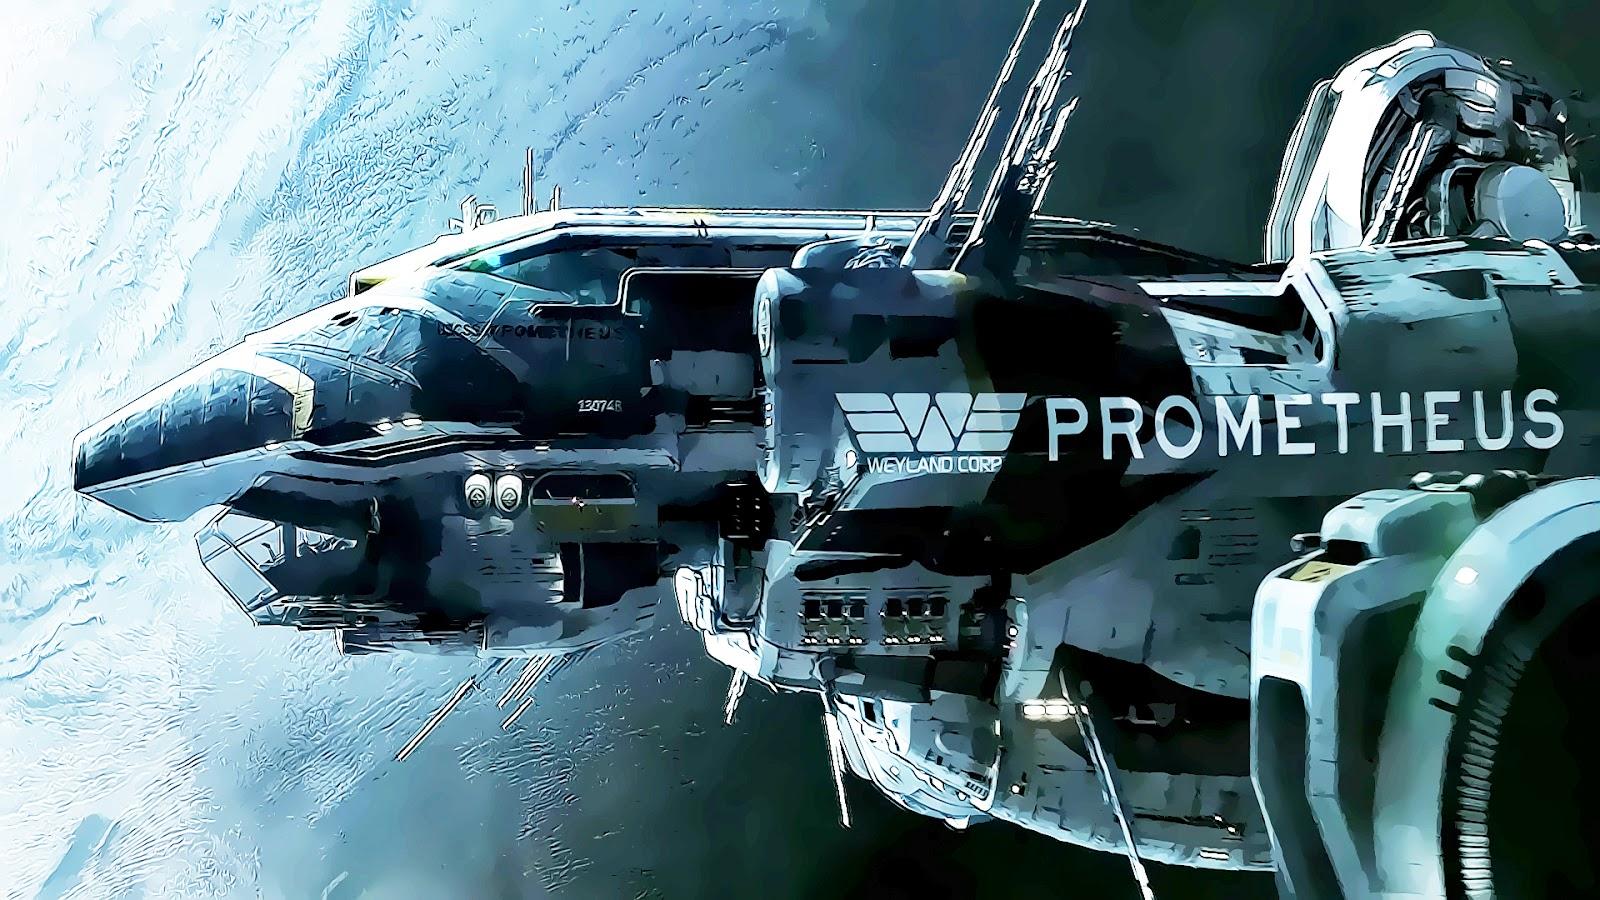 http://1.bp.blogspot.com/-Fl7SIe8lhSk/UFnAyx15z_I/AAAAAAAAGcU/3UPpjttiDEI/s1600/prometheus-spaceship-movie-ridley-scott-alien-science-fiction.jpg